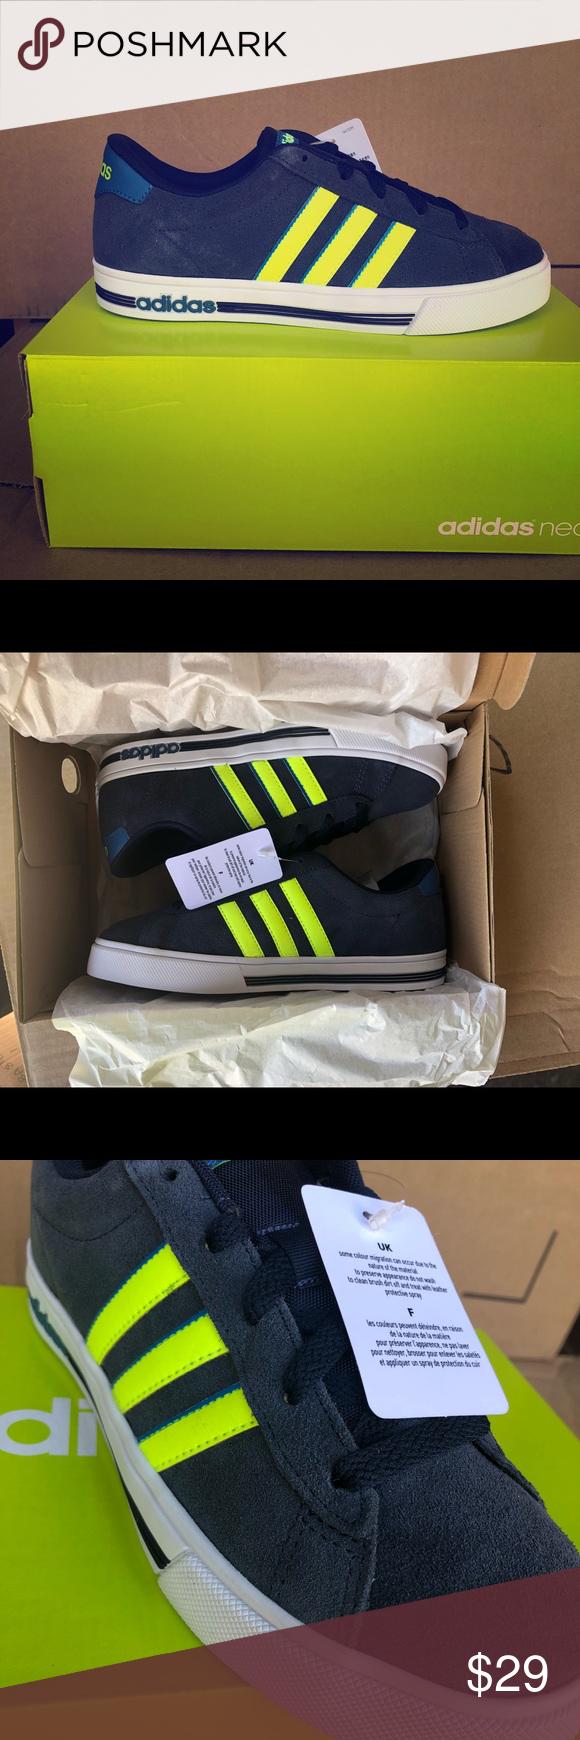 Adidas Daily Team K Kids Shoes BC0156 K3 Boutique | POSHMARK